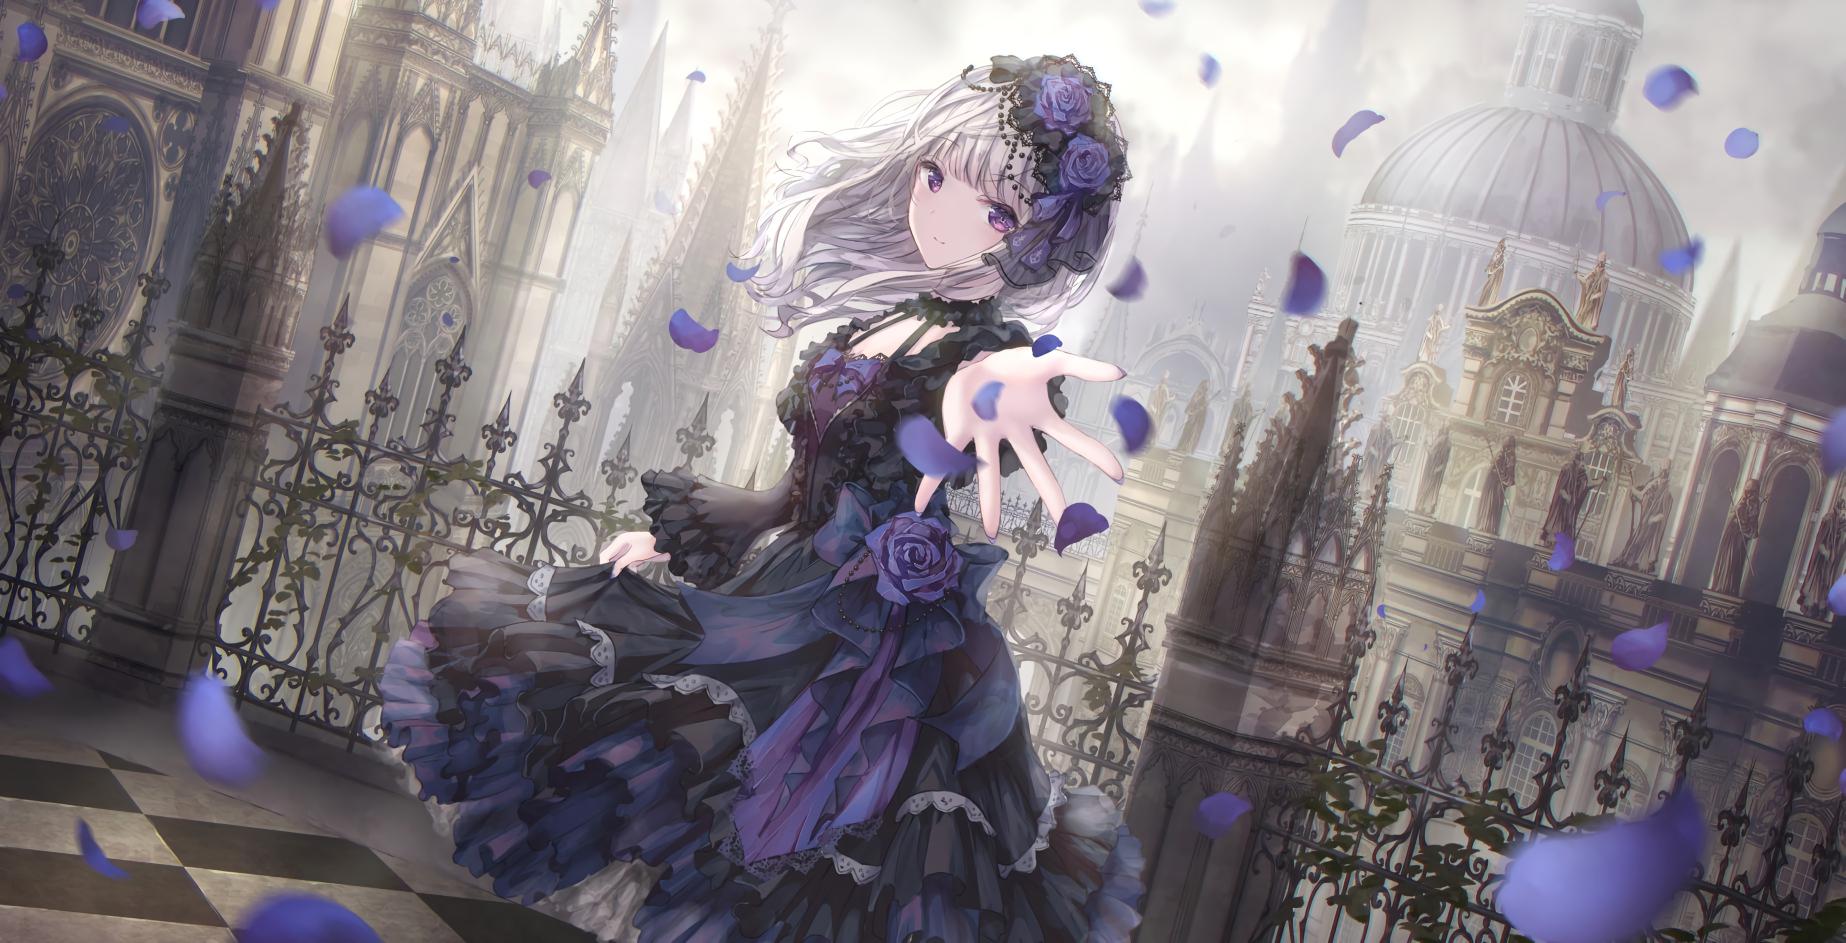 Anime Anime Girls Dress Silver Hair Purple Eyes Gothic Lolita Missile228 Artwork 1846x943